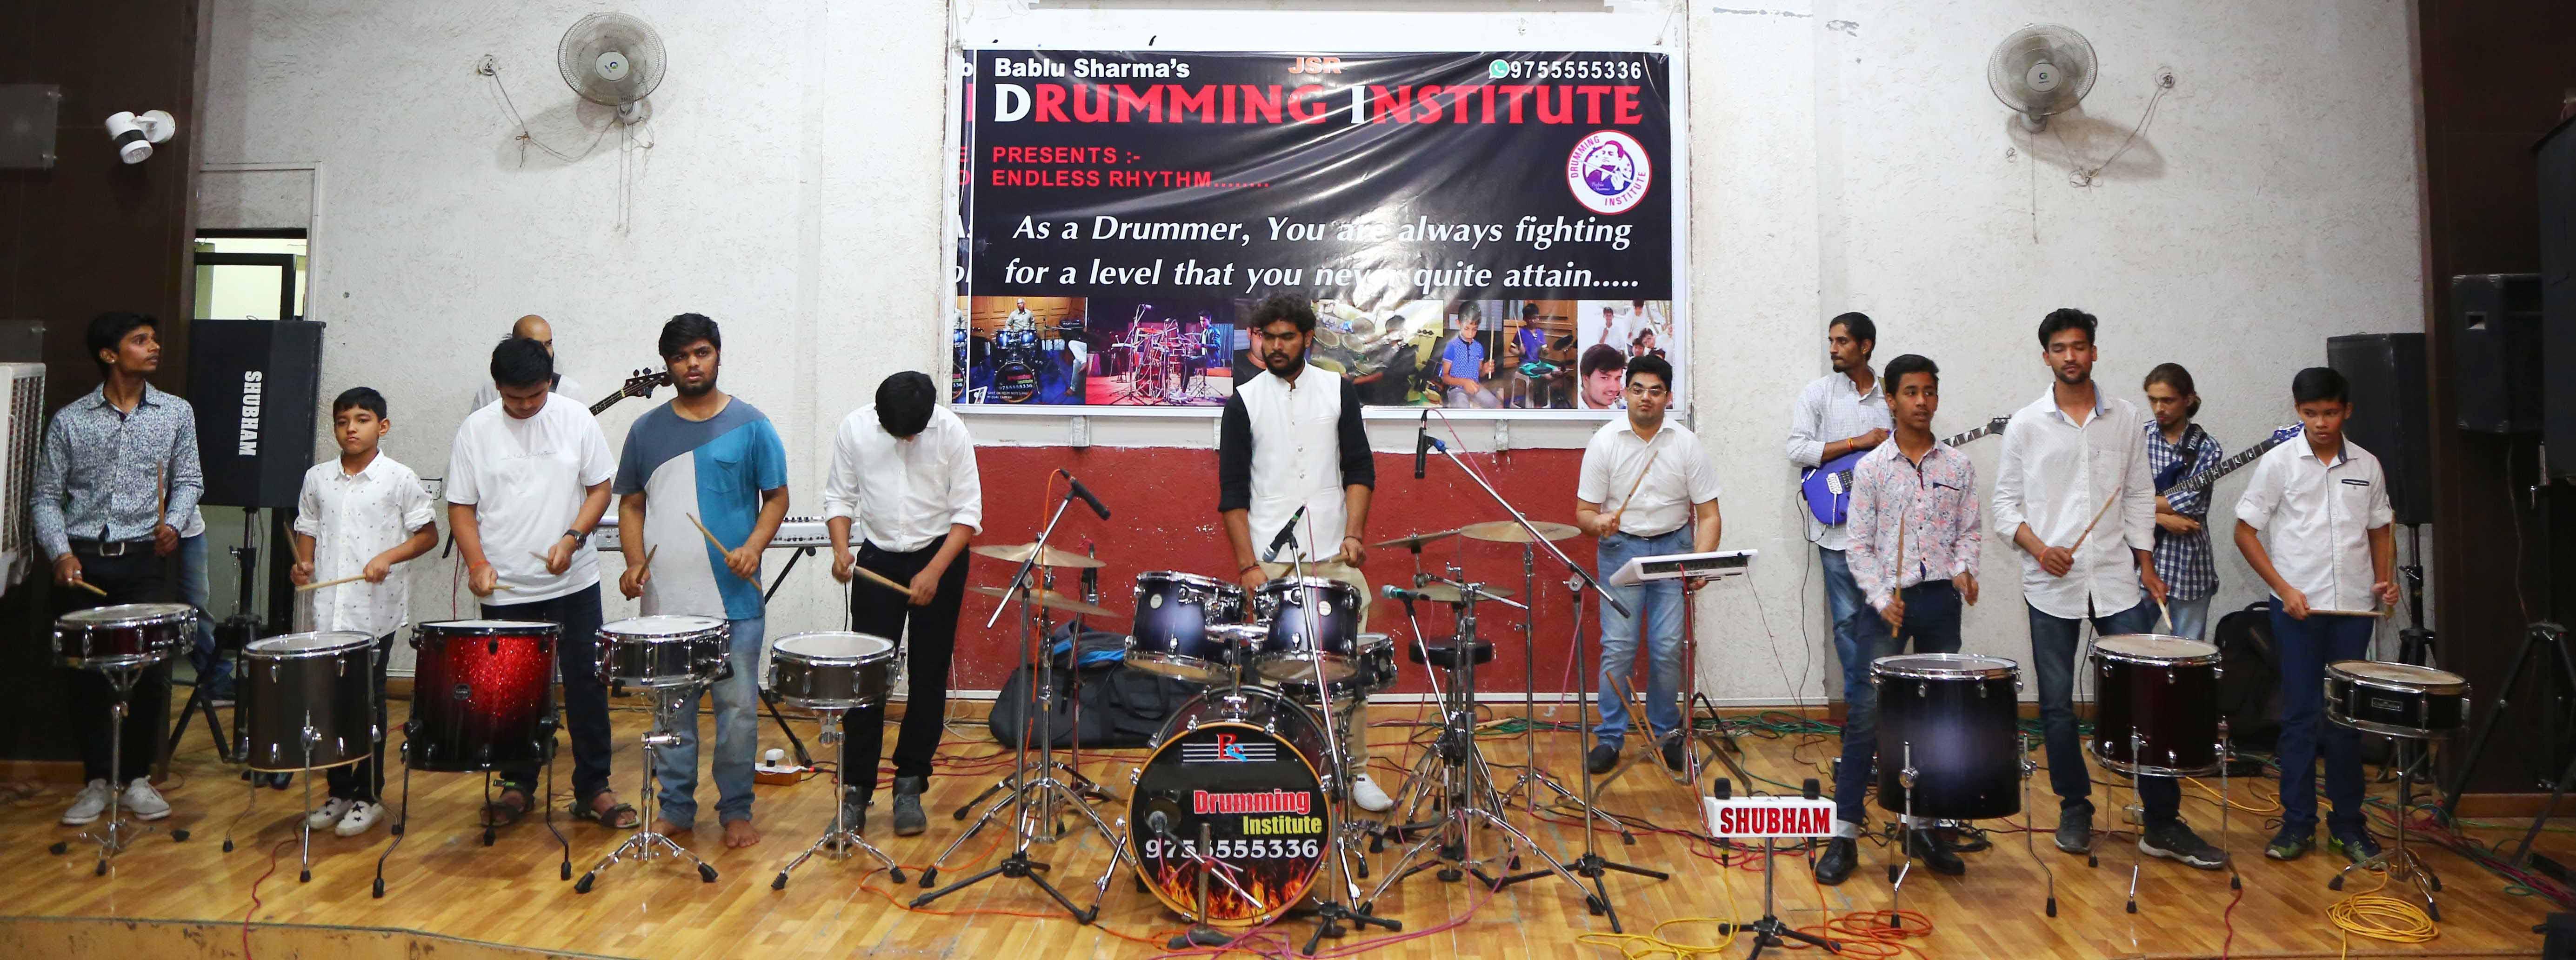 Drumming event (2)